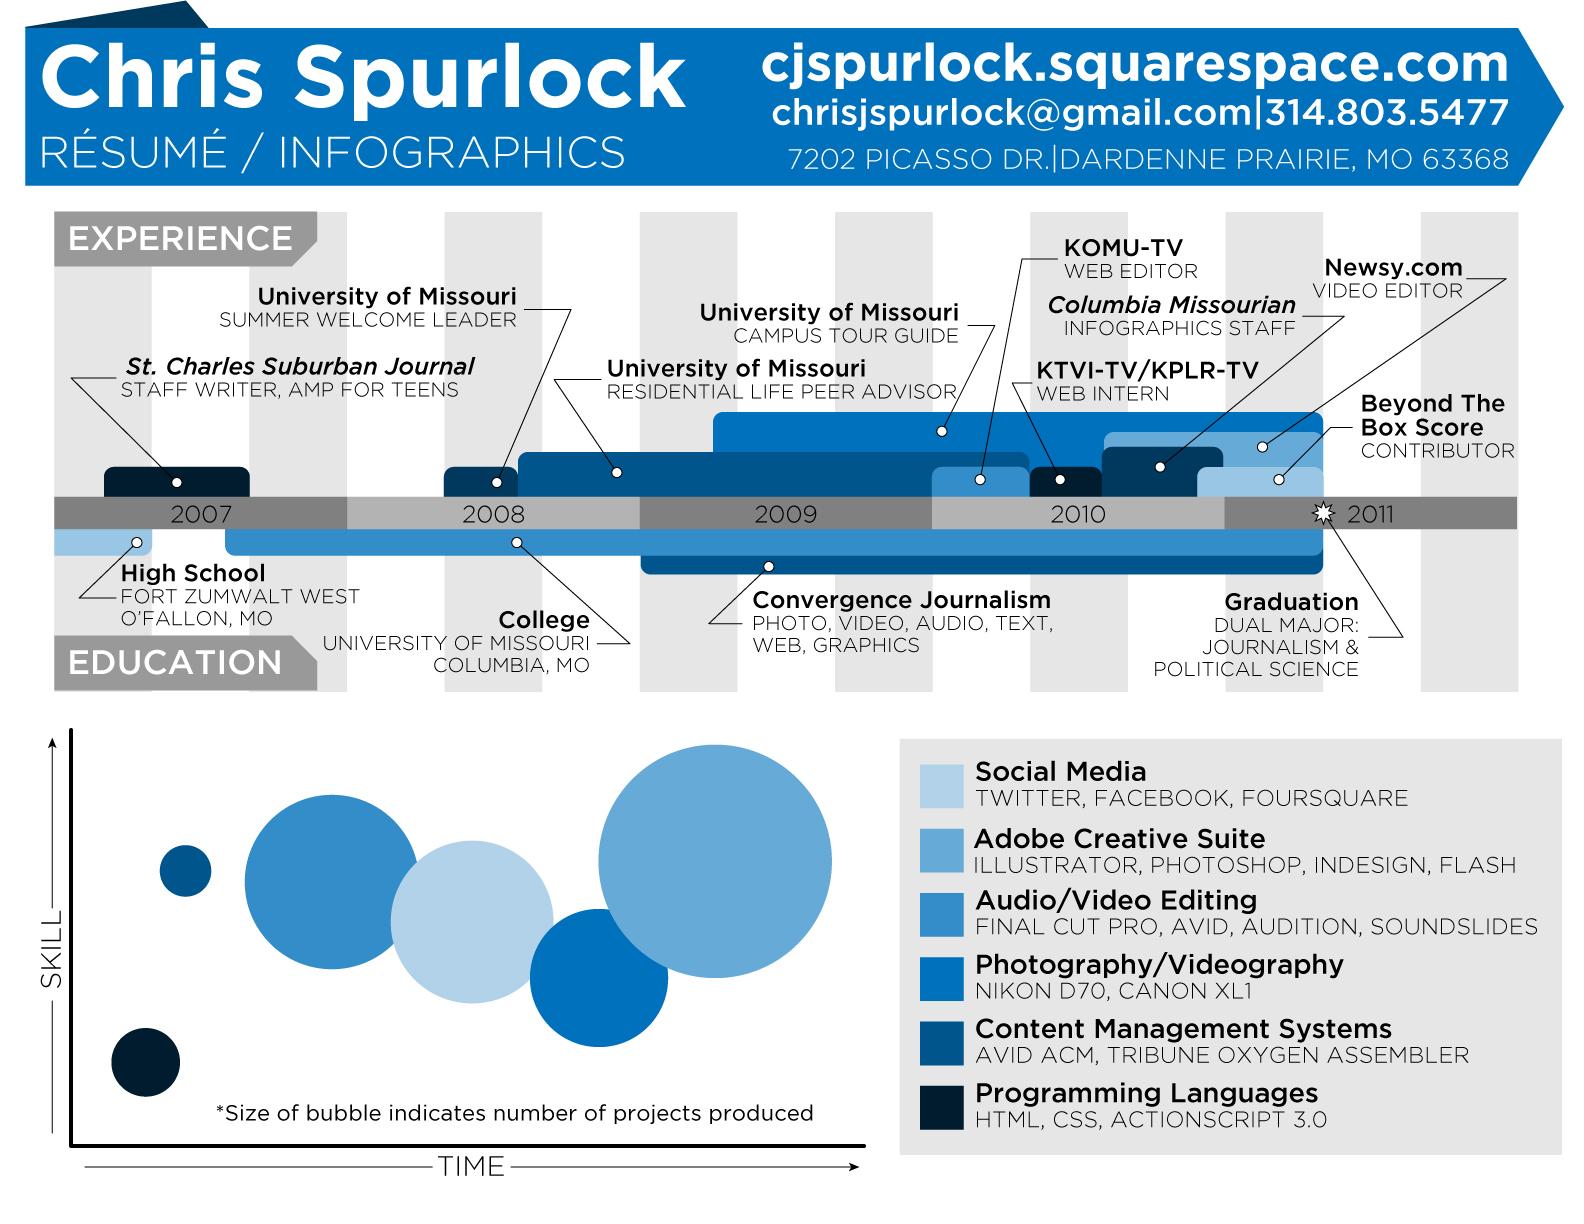 cv-infographie-1